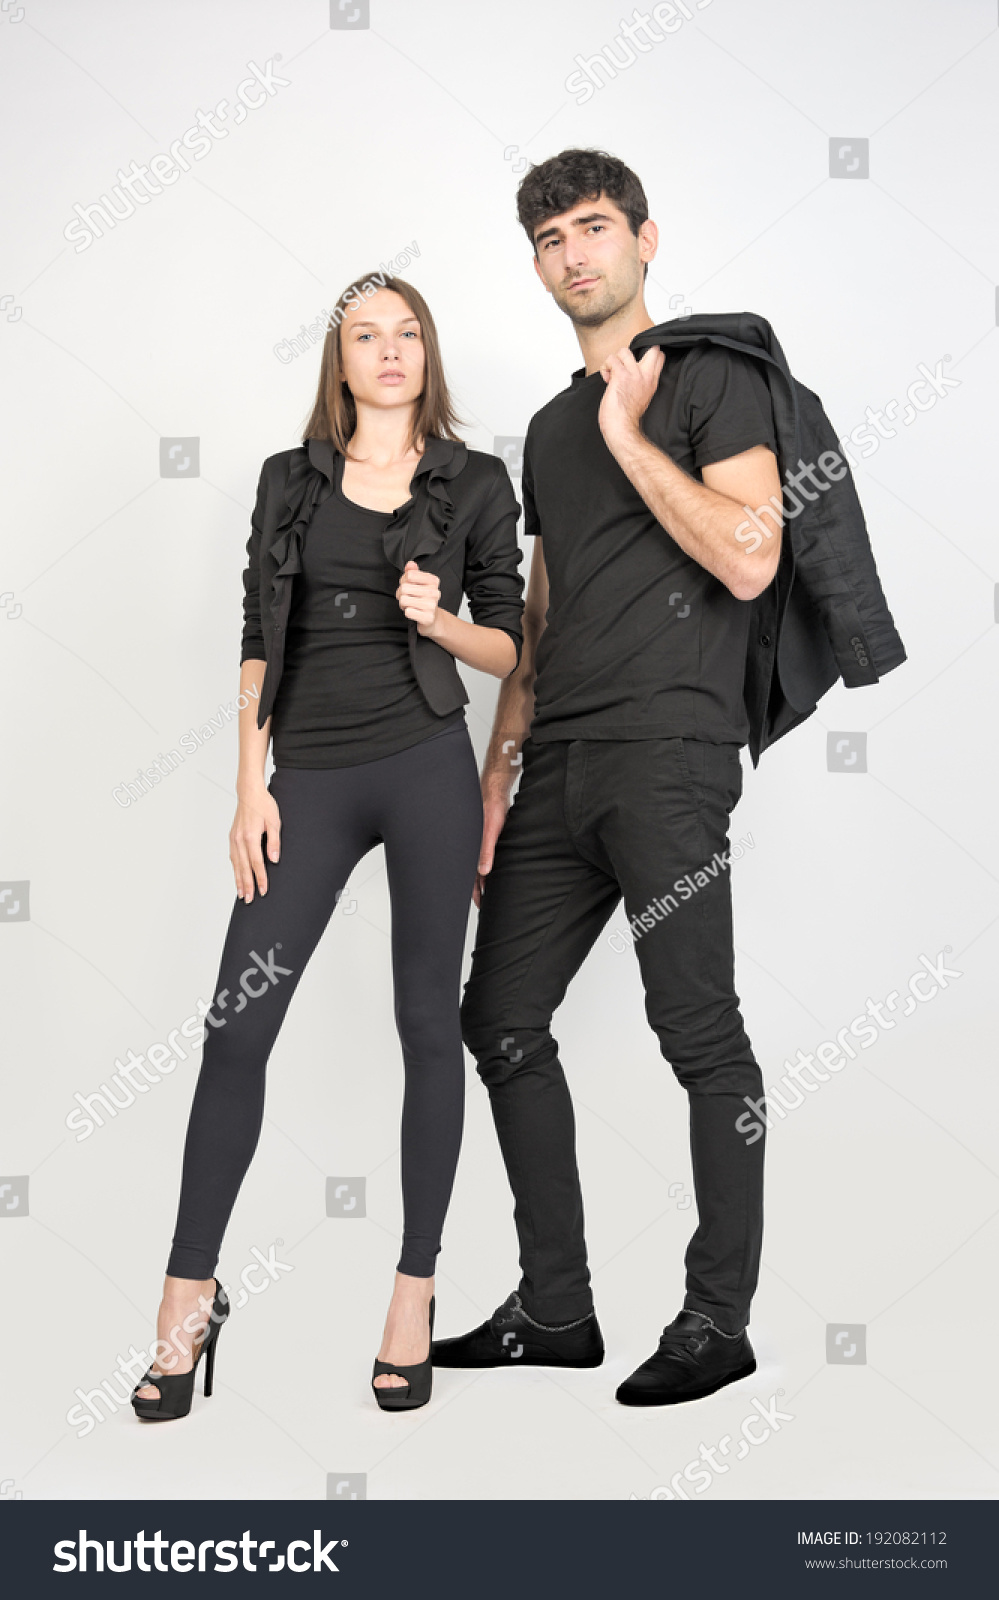 Female Male Fashion Models Wearing Black Stock Photo ...